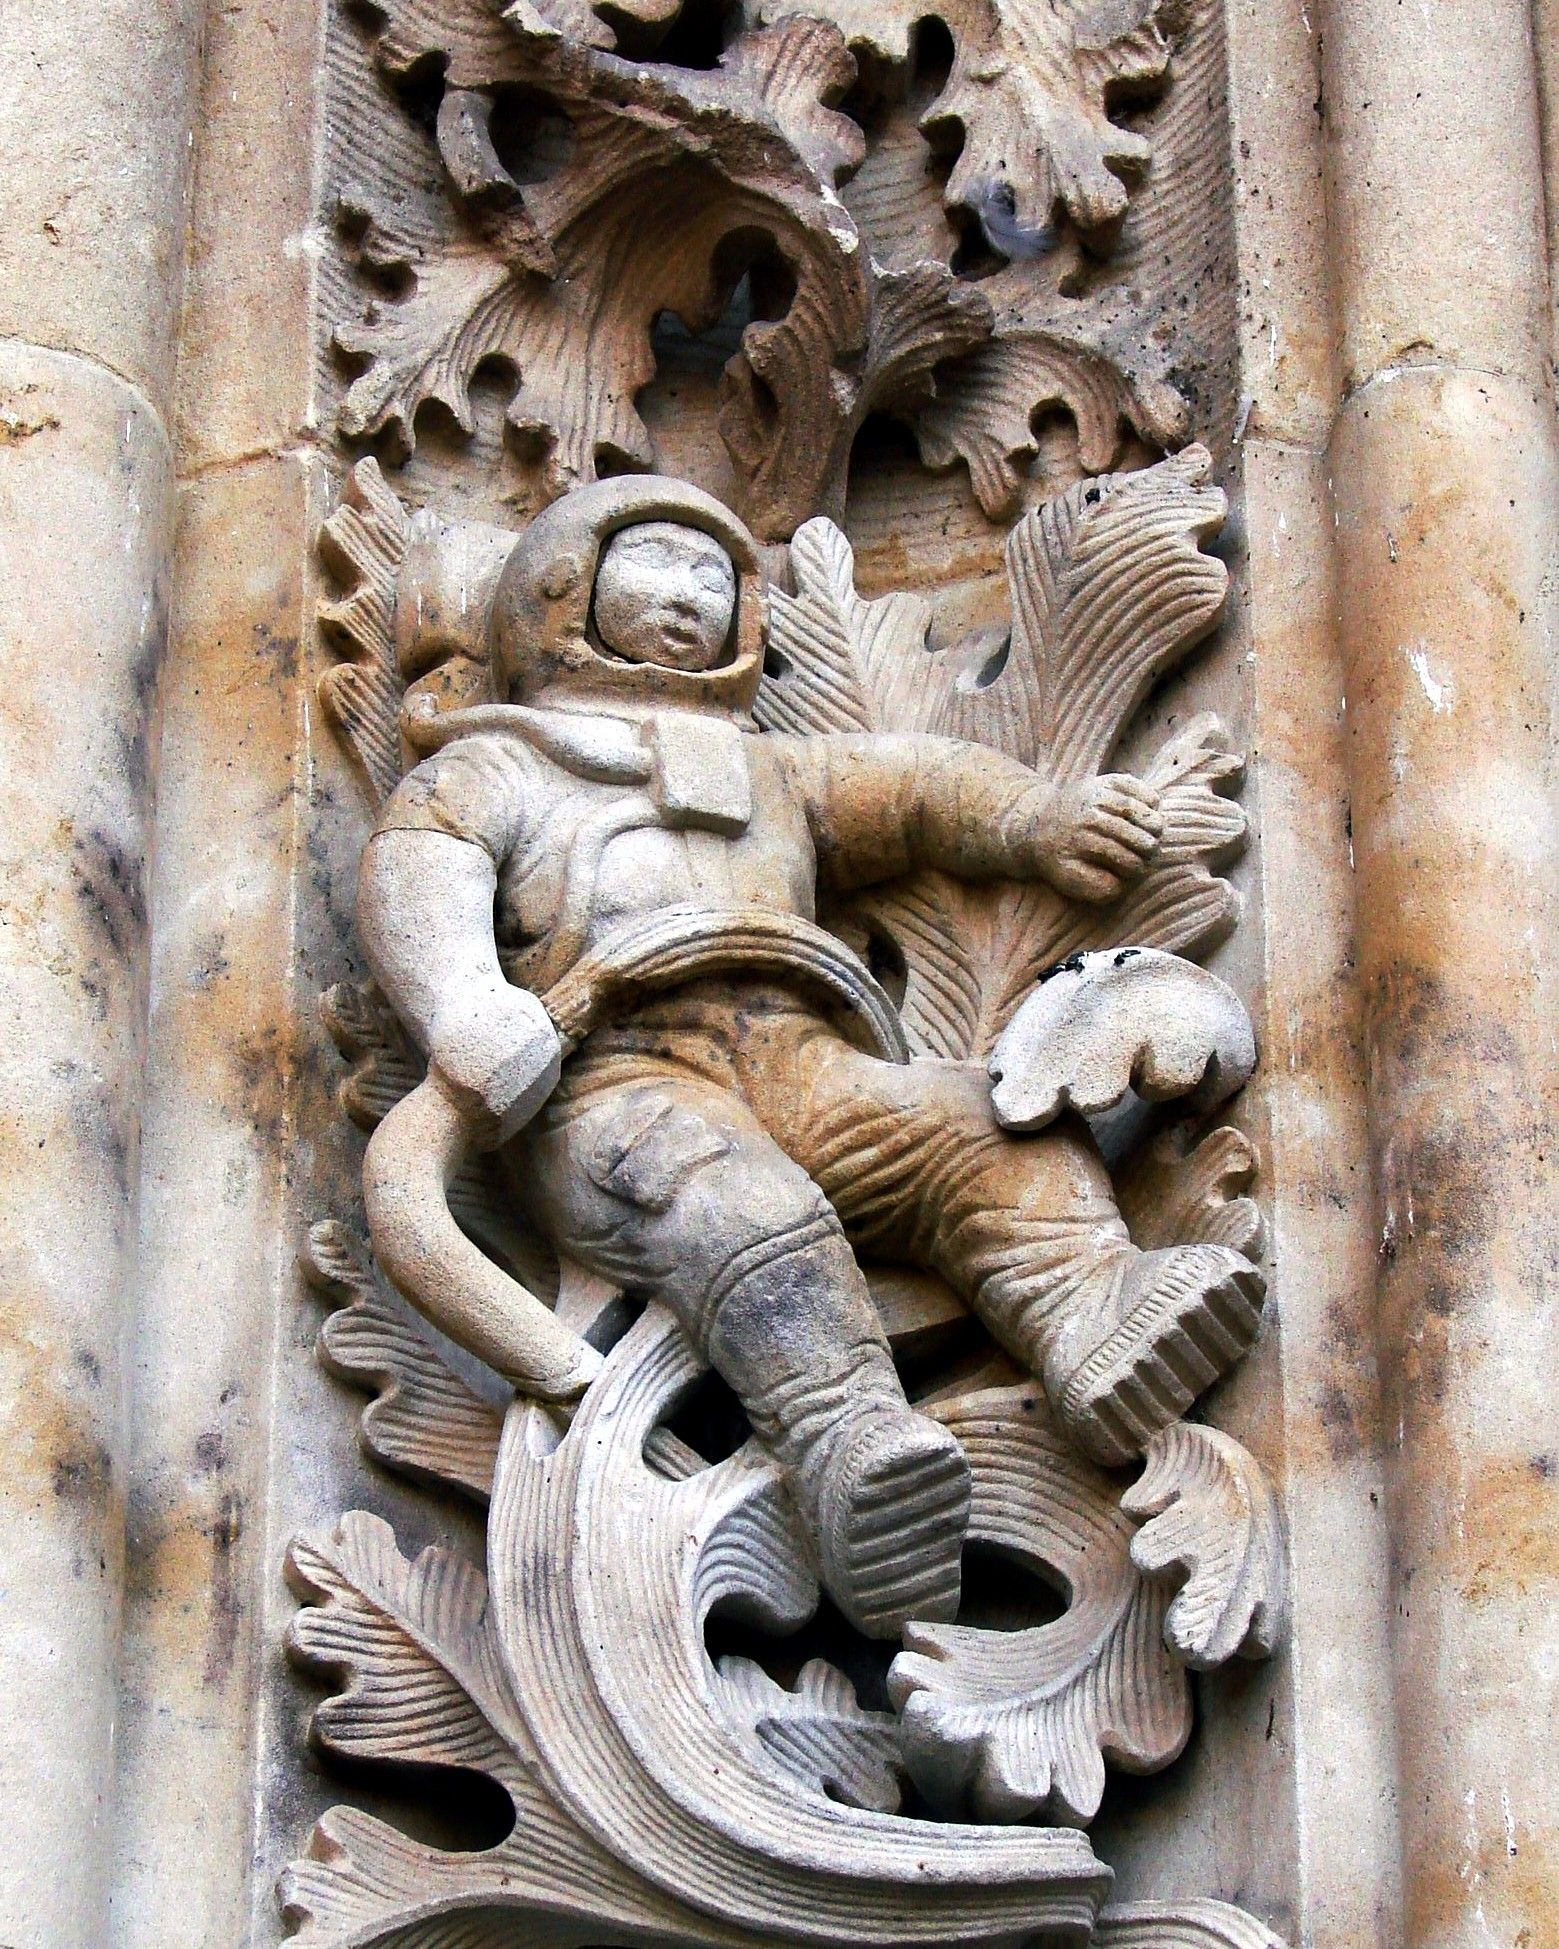 Inca astronaut carving